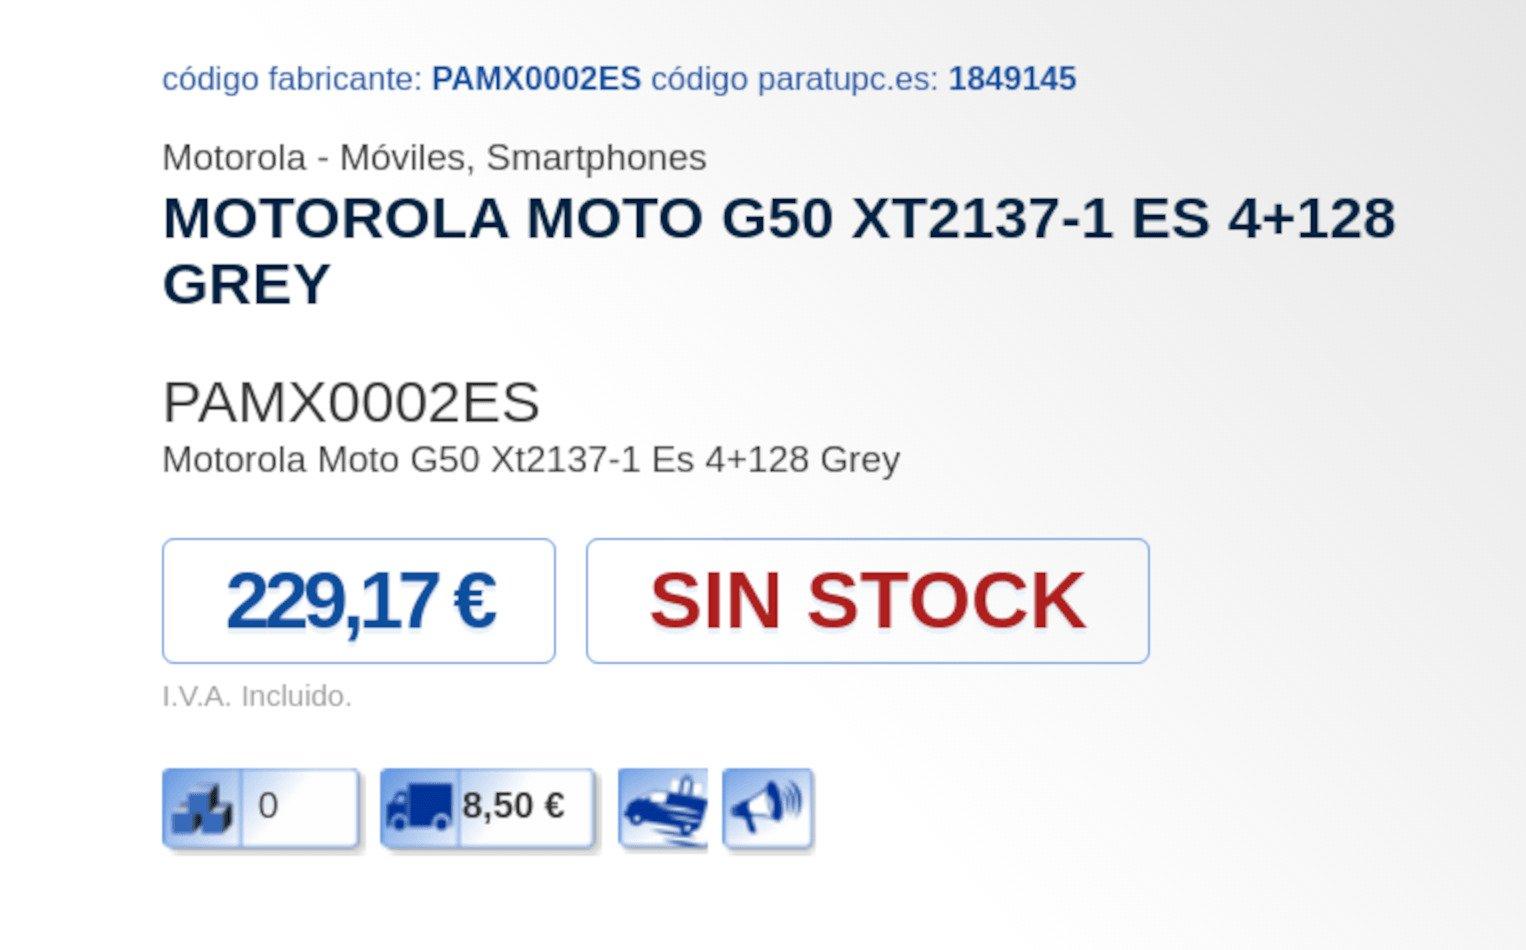 Motorola Moto G50 Leaked Pricing in Spanish